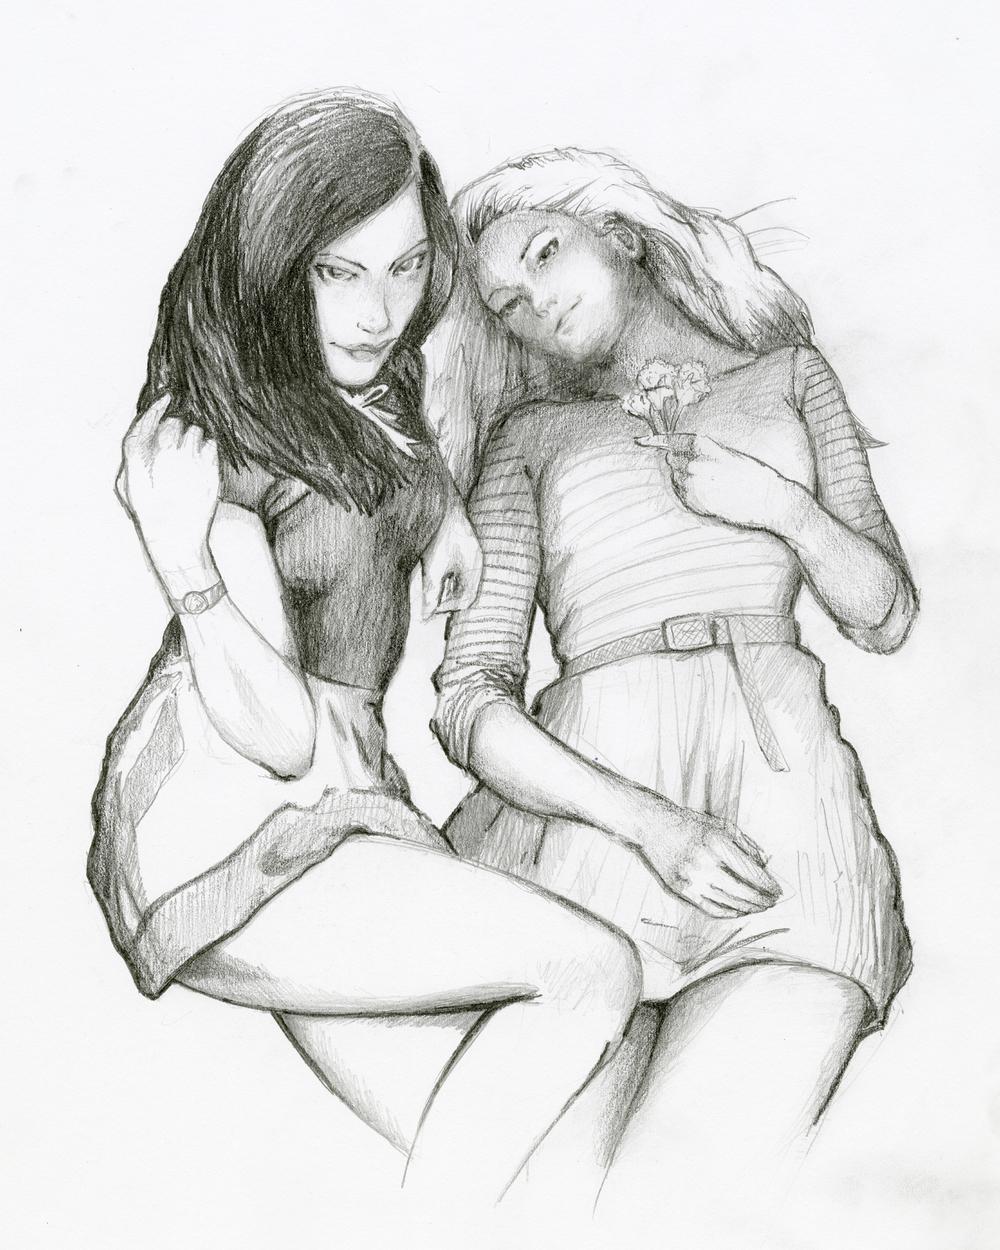 sketch-girls2_david-jackowski_alvatron-studio.jpg